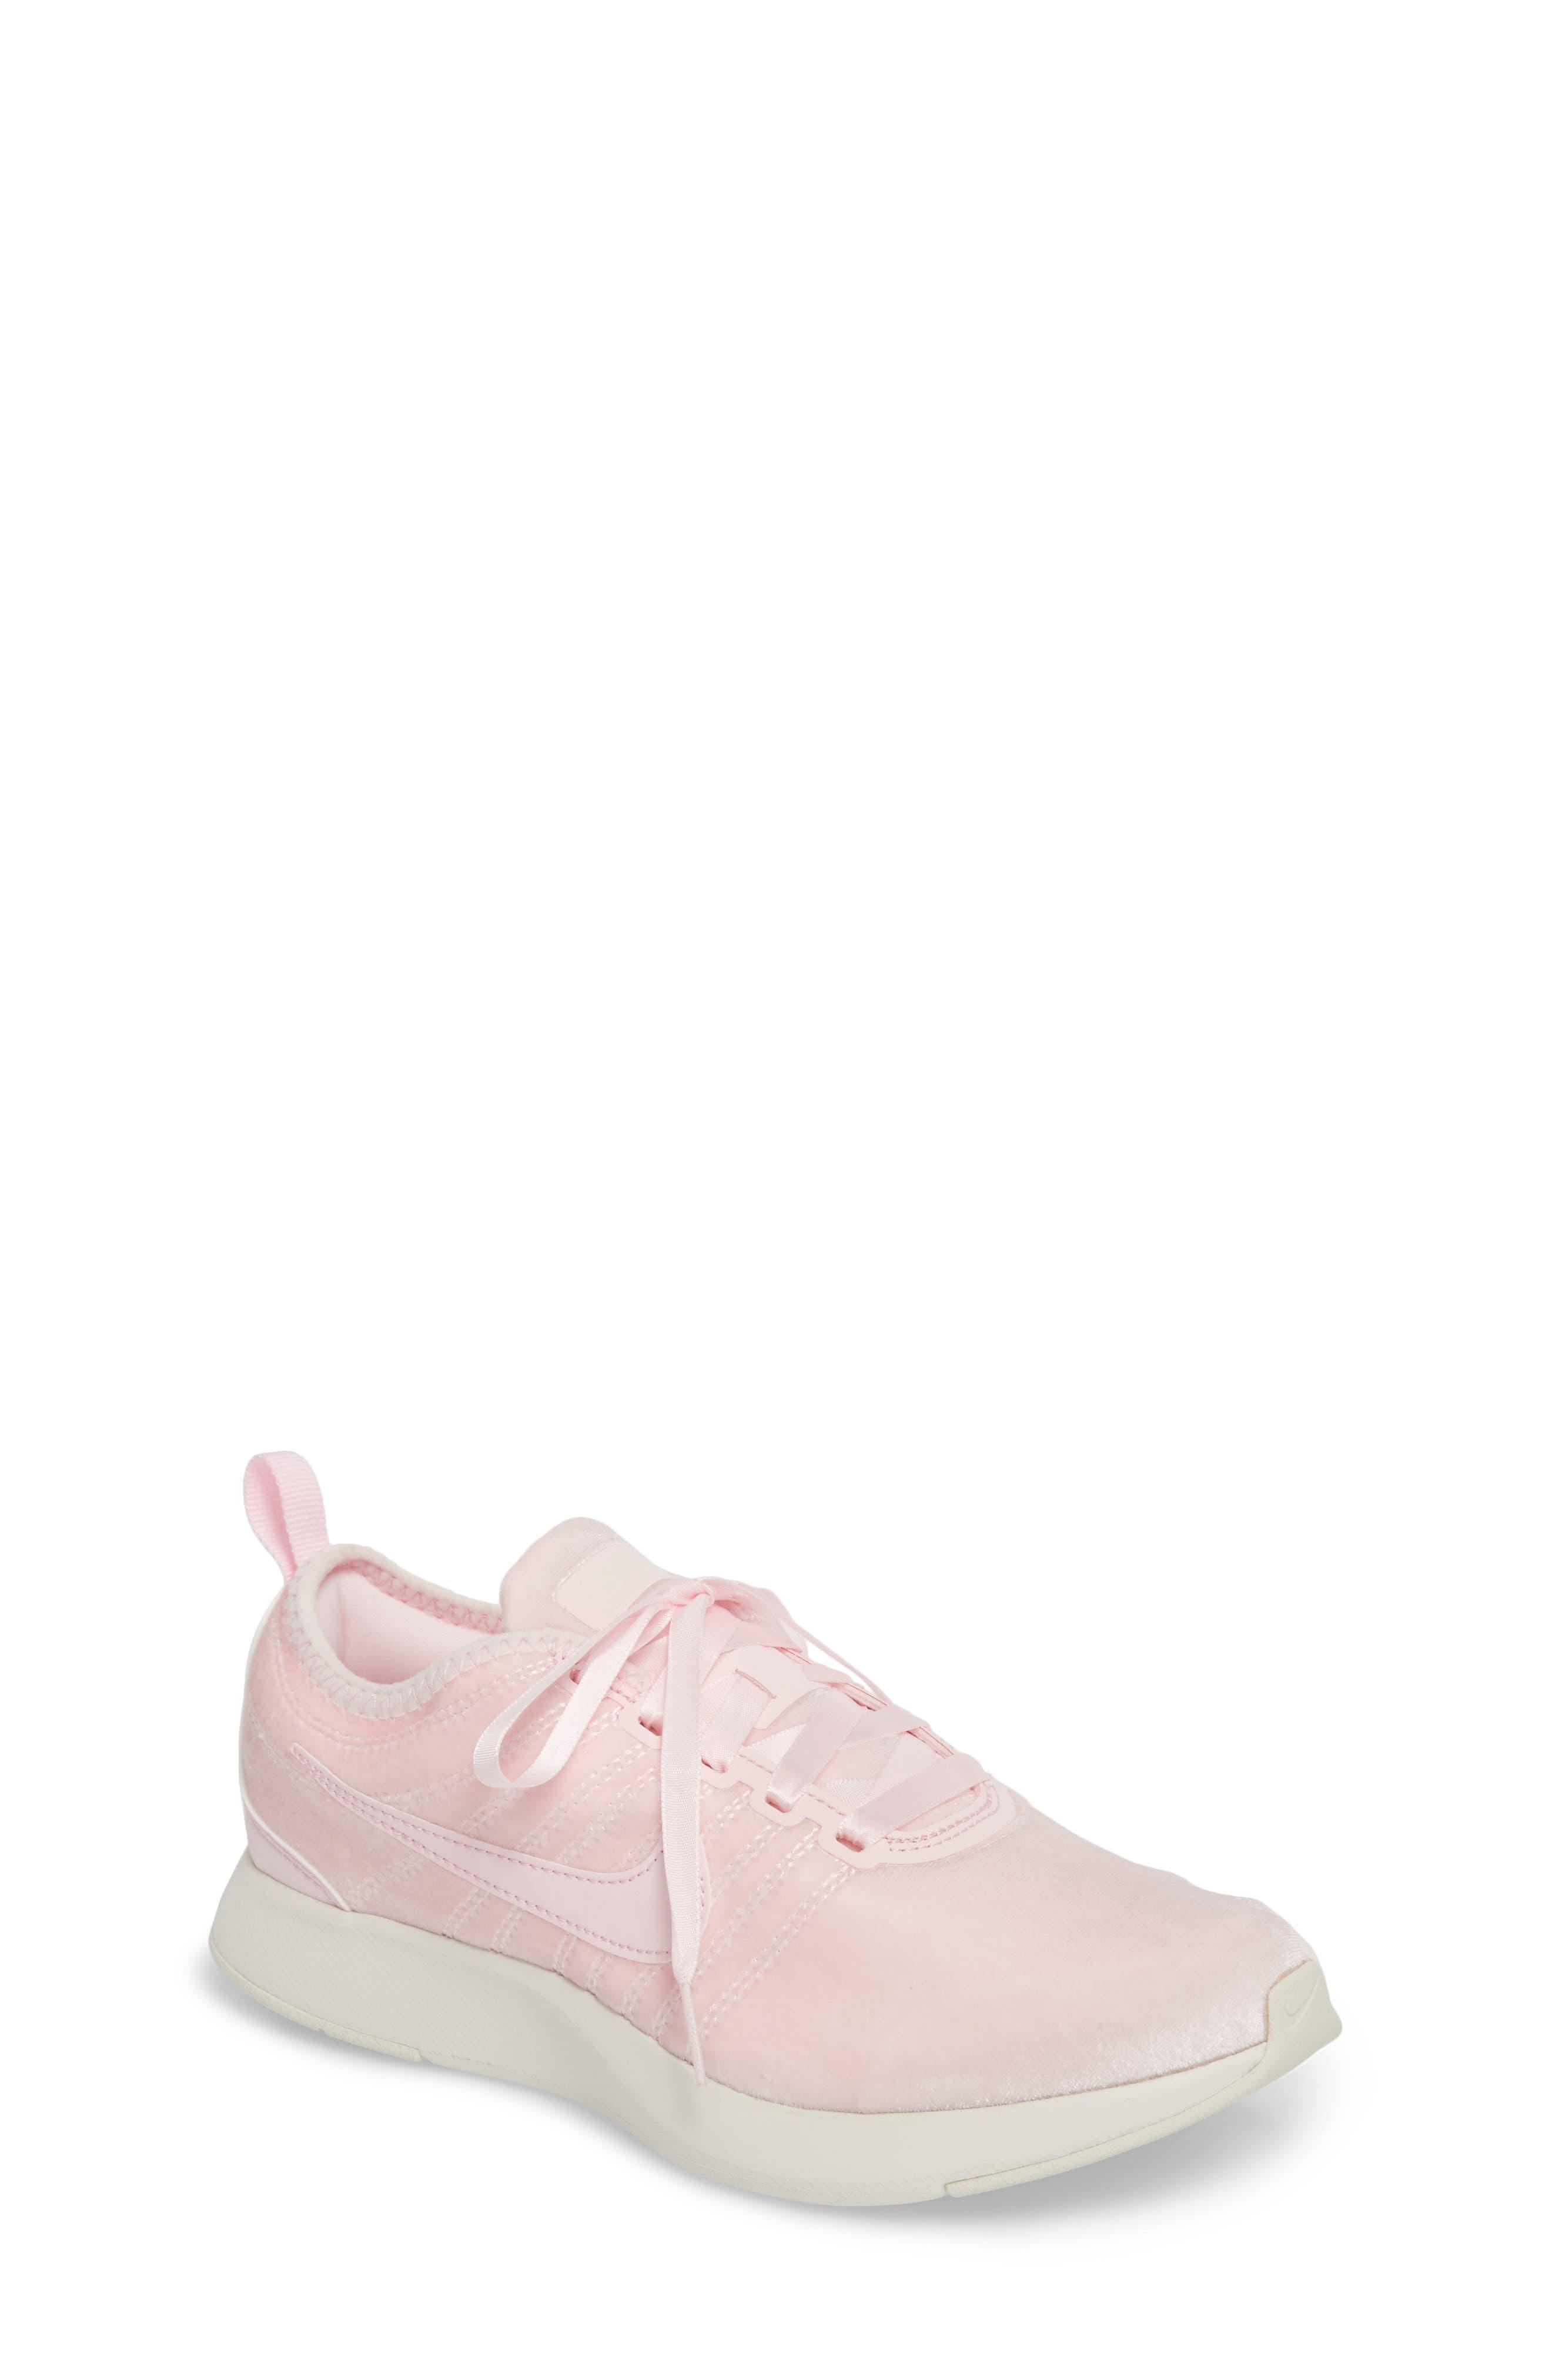 Dualtone Racer SE Sneaker,                         Main,                         color, Arctic Pink/ Arctic Pink/ Sail